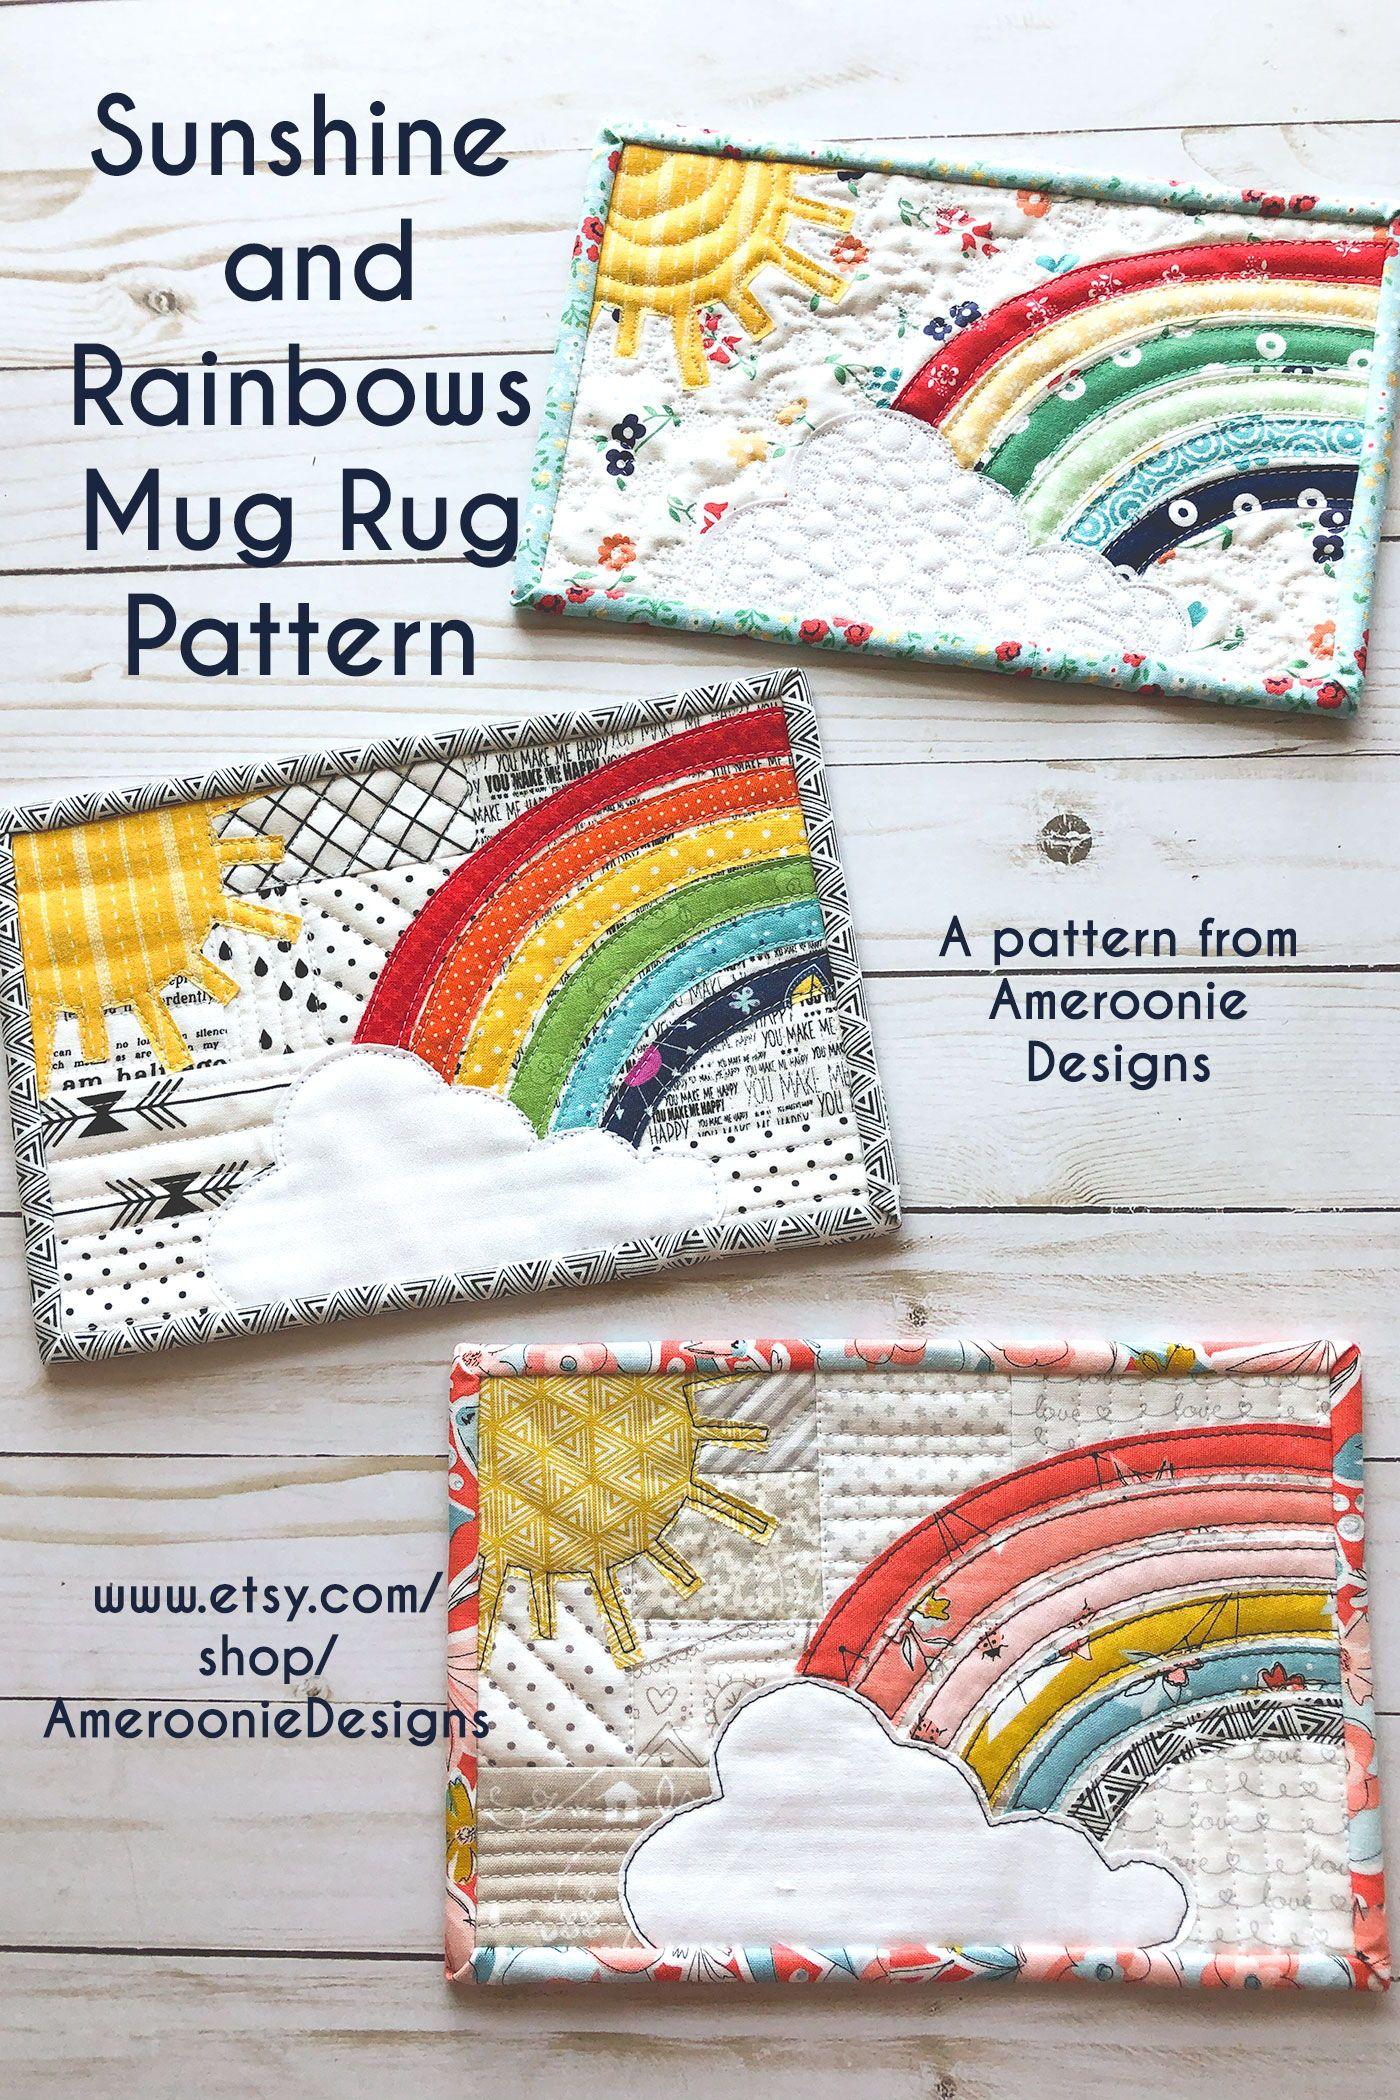 Pattern Sunshine And Rainbow Applique Mug Rug Pdf Pattern Etsy In 2020 Mug Rug Mug Rug Patterns Moda Fabric Quilts